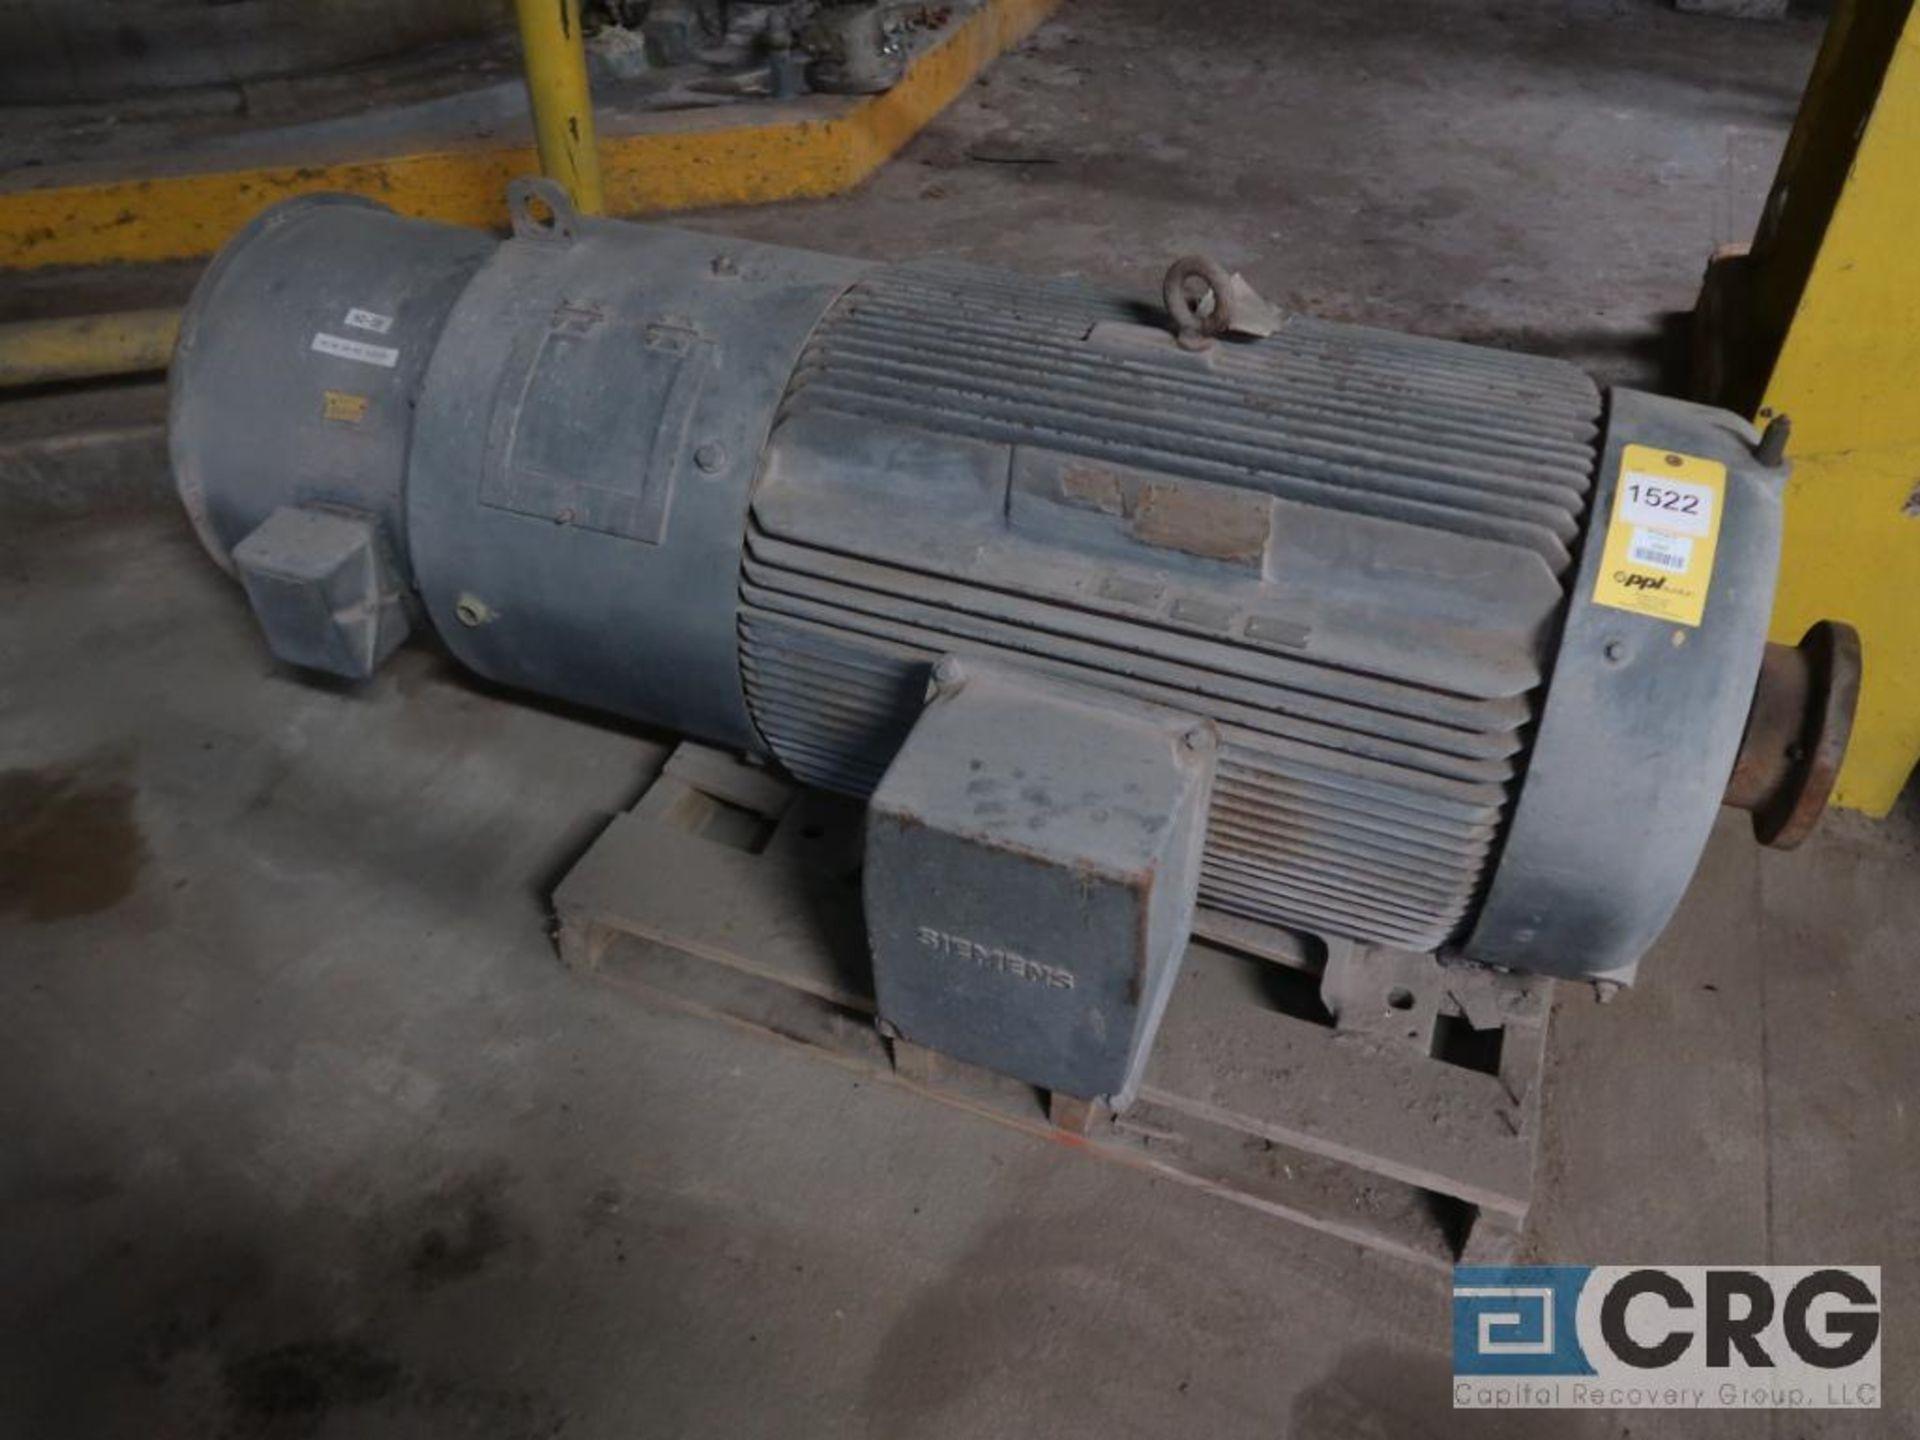 Siemens motor, 250 HP, 1,783 RPM, equipment #E04787 (496 Dock Area)